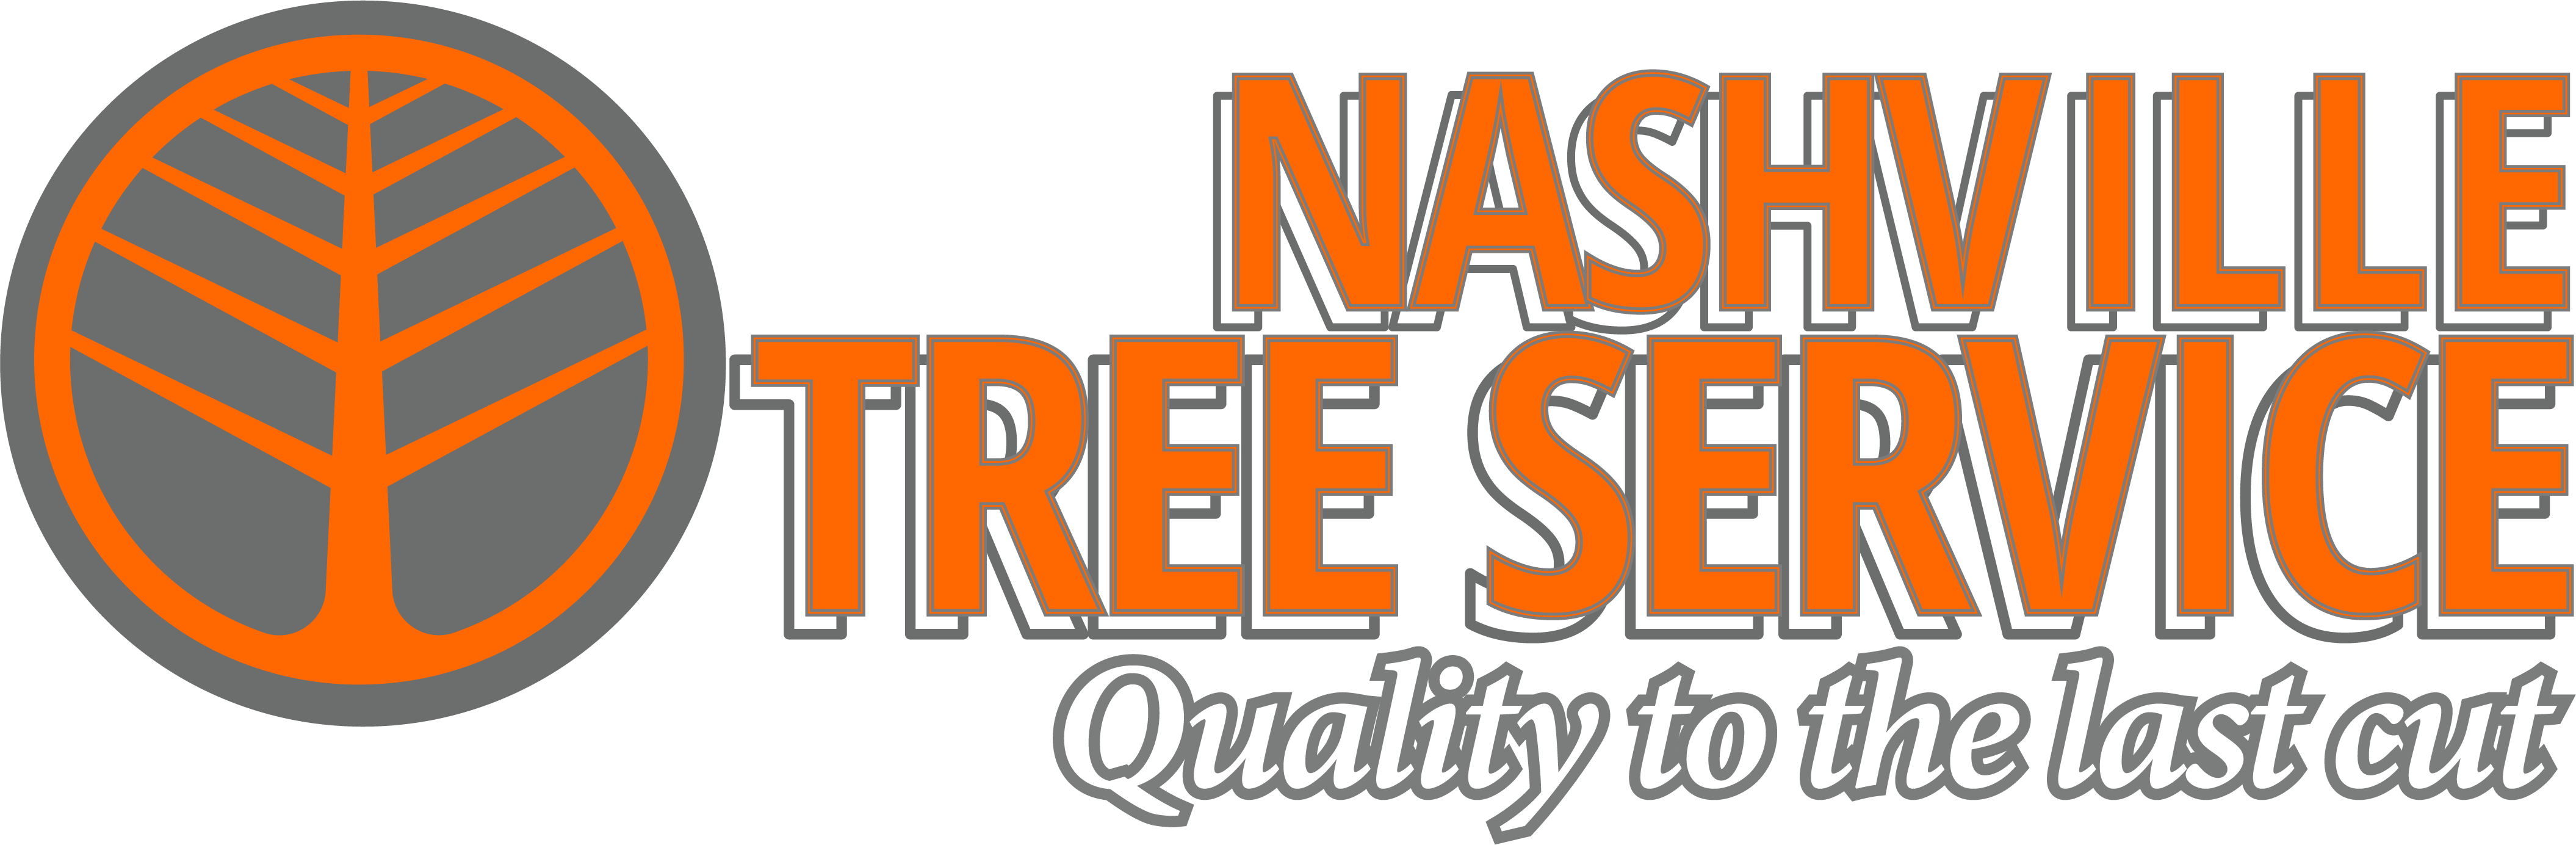 Nashville Tree Service